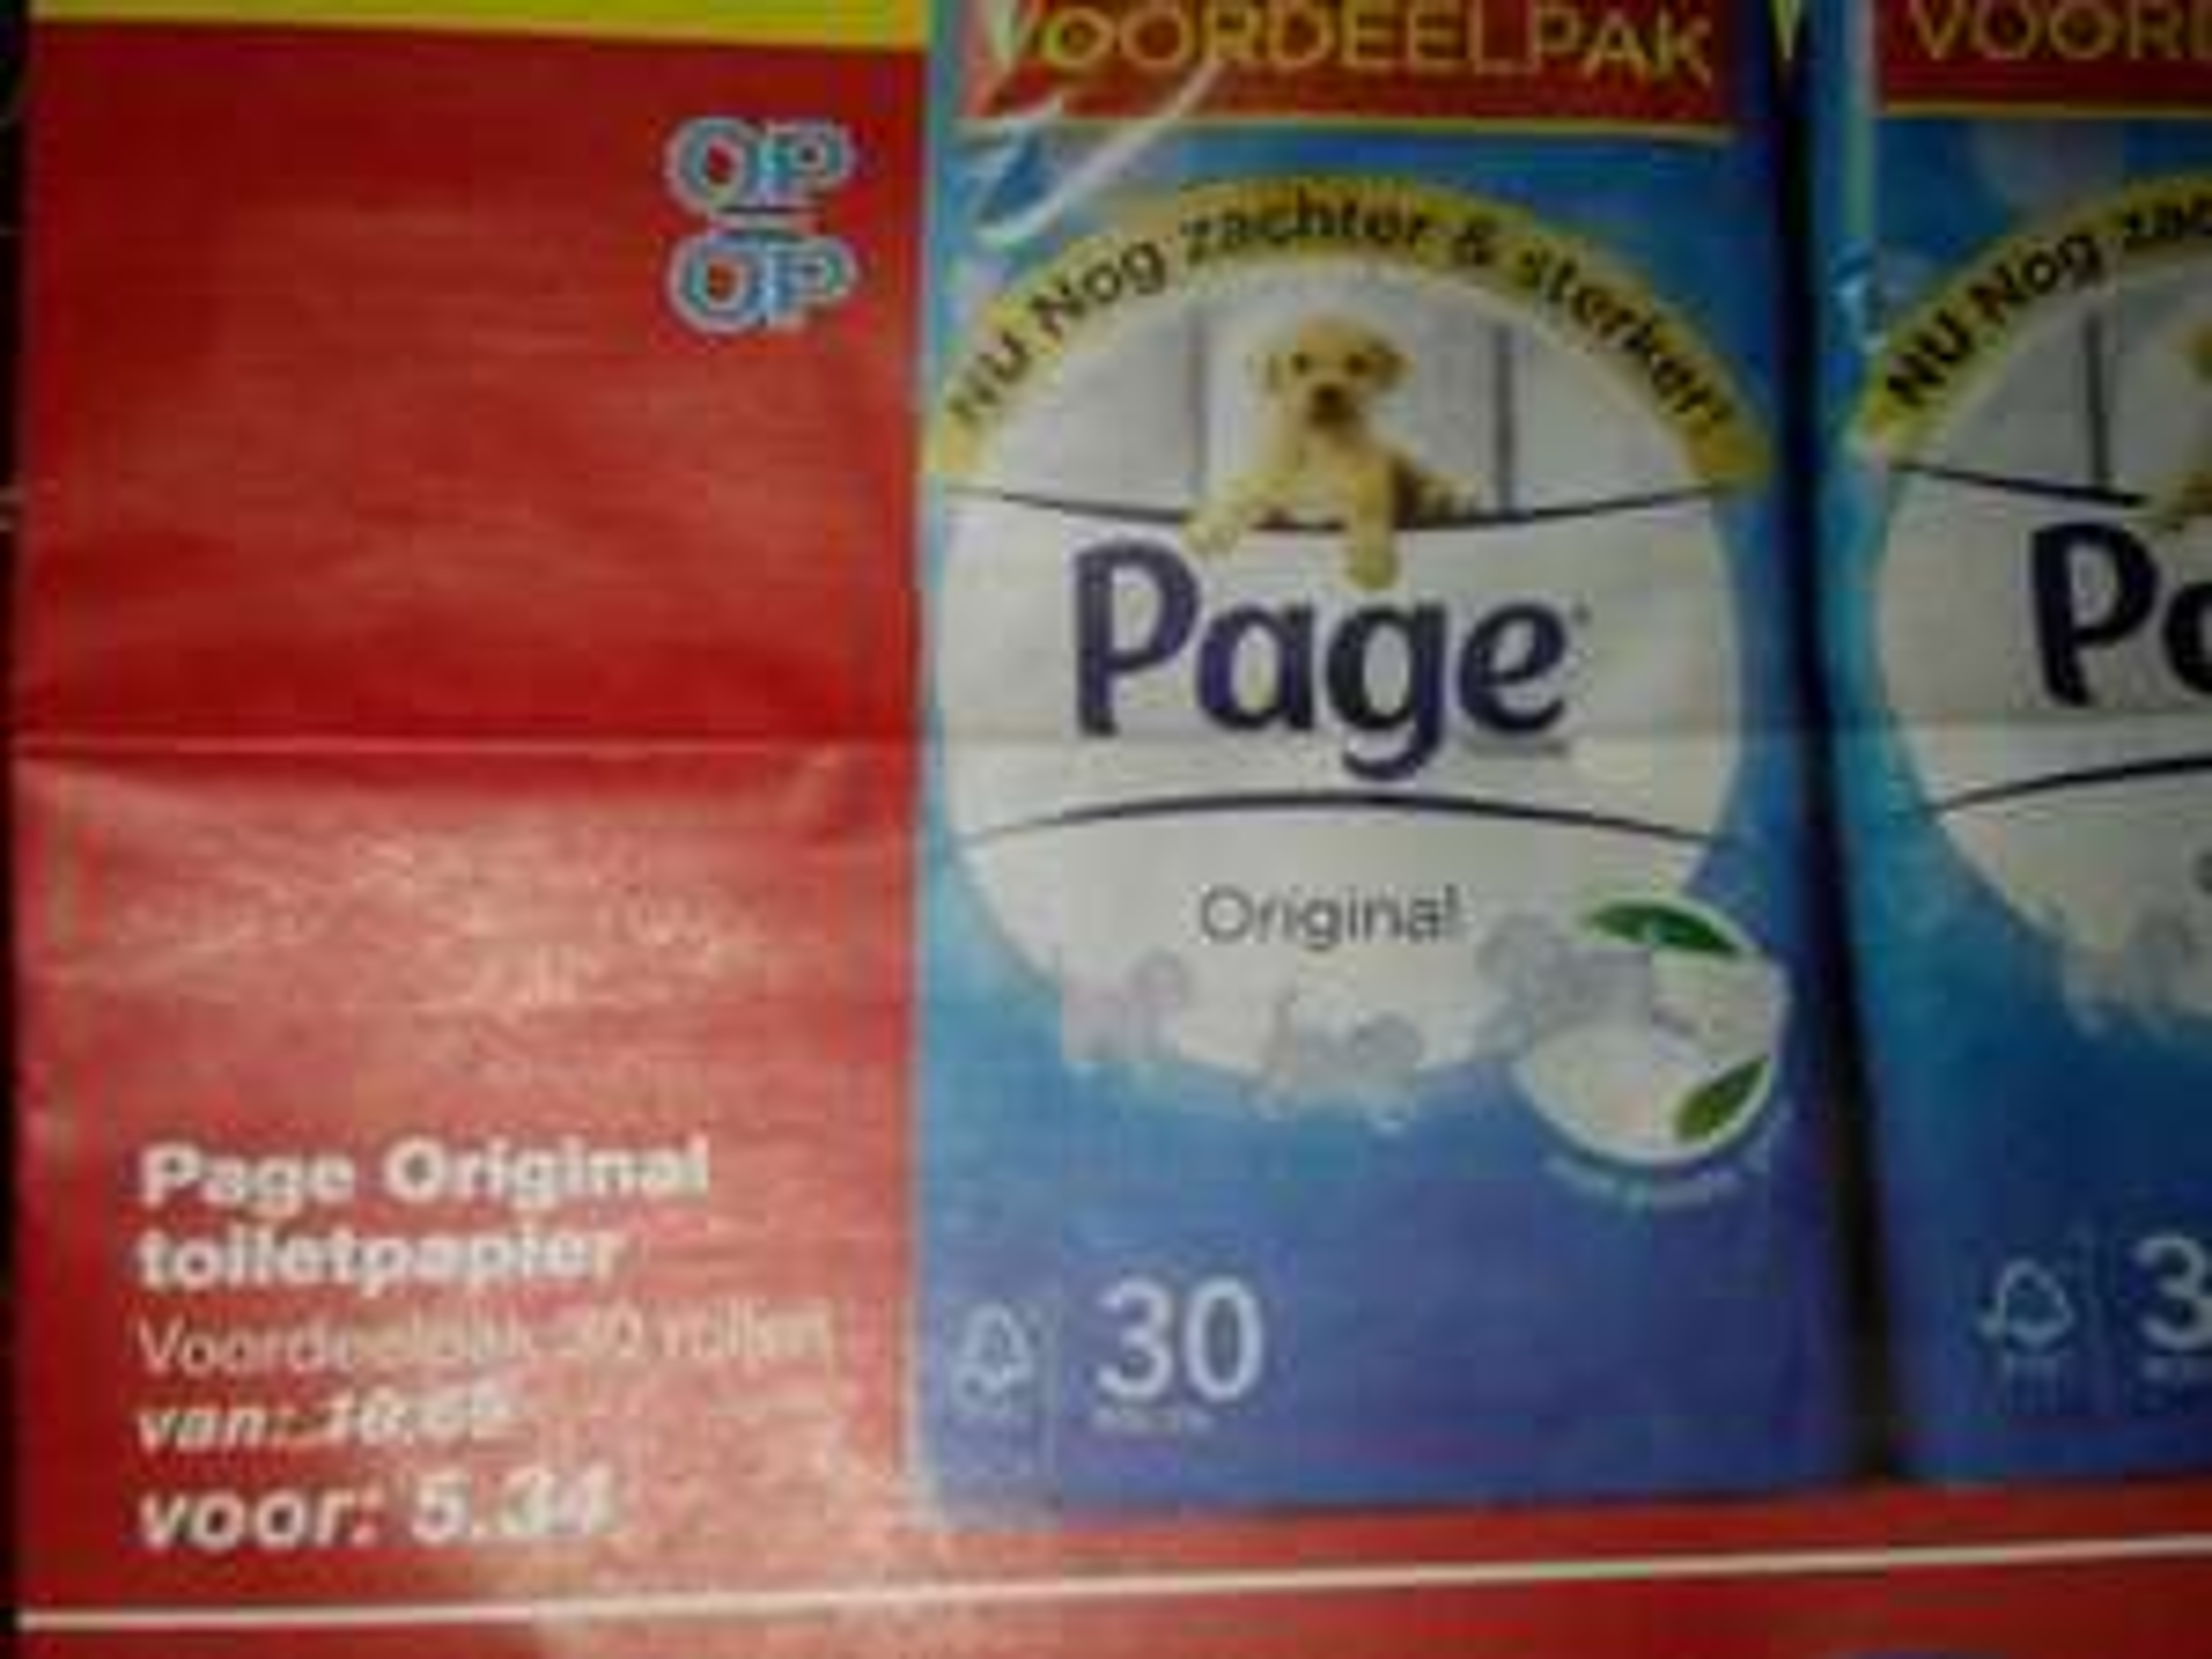 Page Orginal toiletpapier 30 rollen @ Hoogvliet